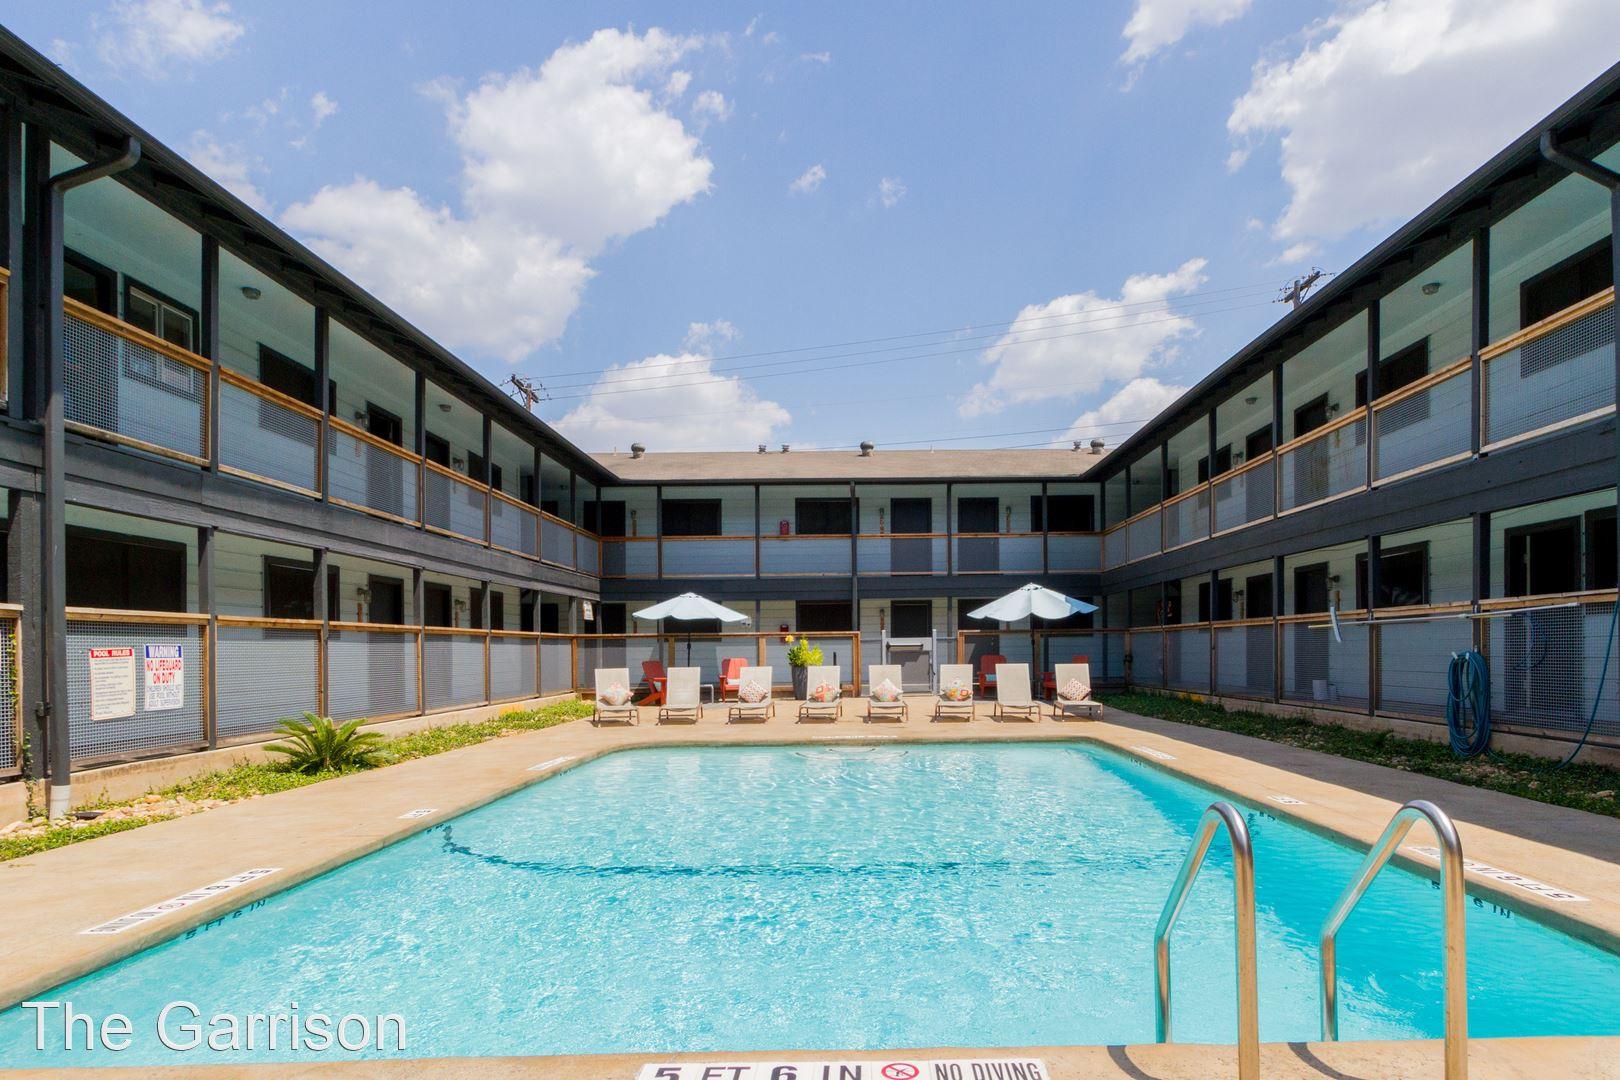 Apartments Near UT Austin The Garrison for University of Texas - Austin Students in Austin, TX